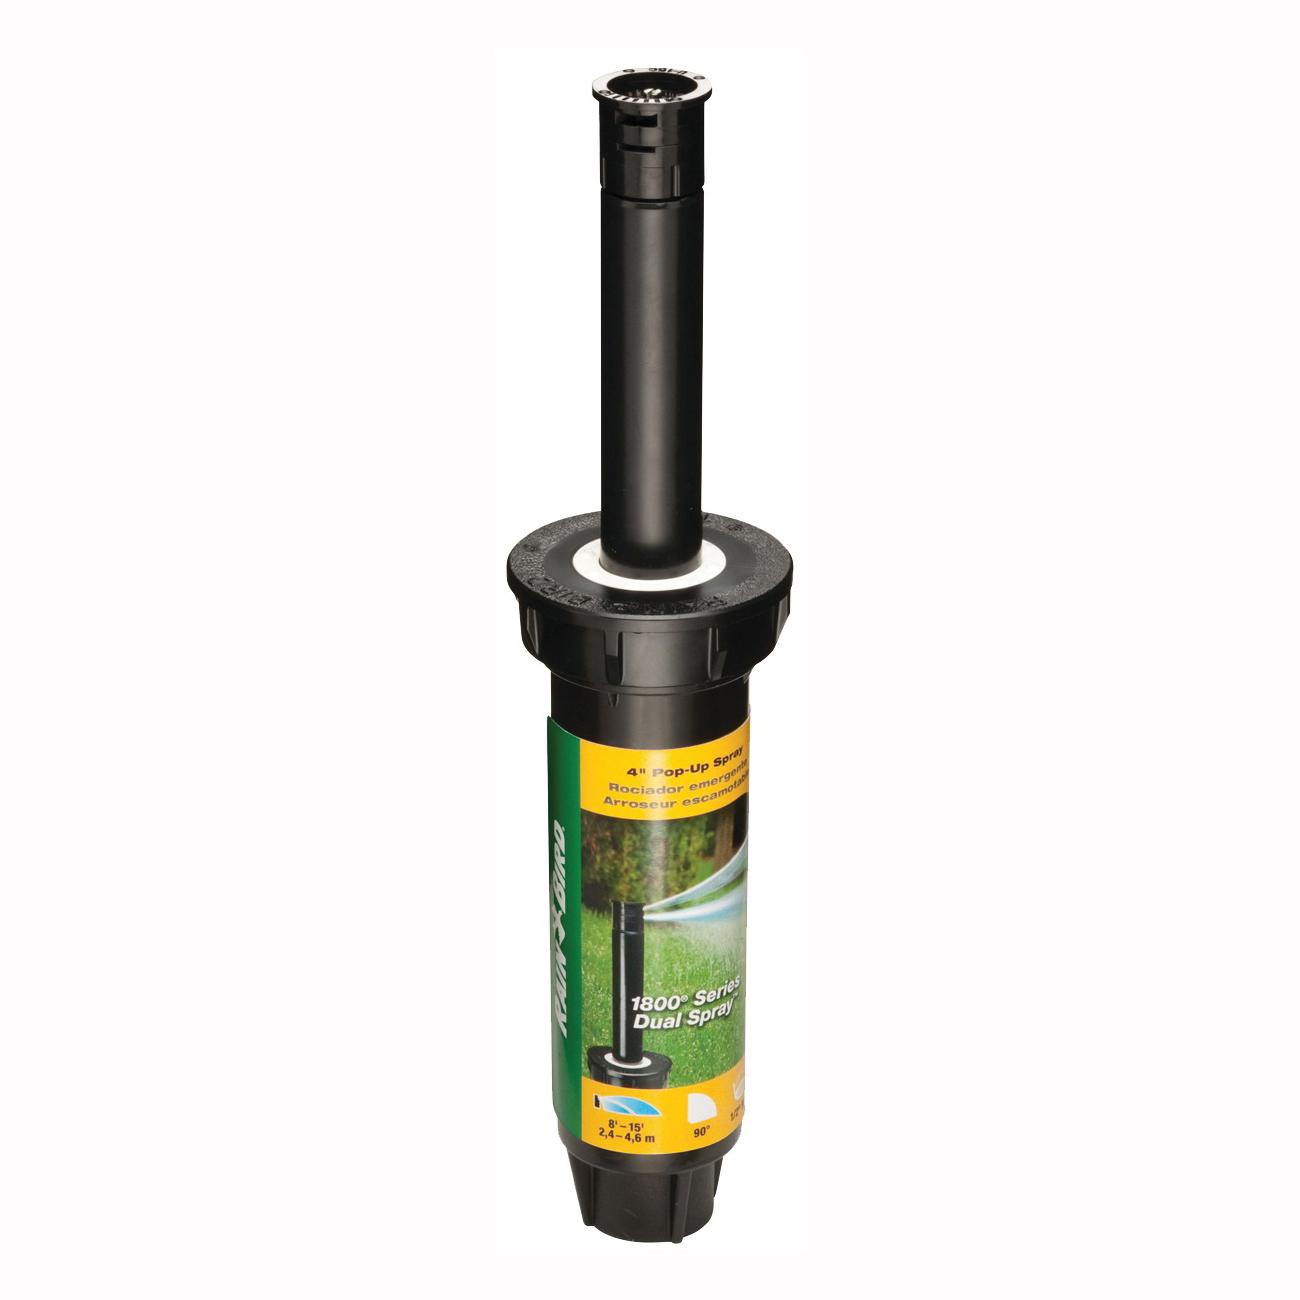 Picture of Rain Bird 1804QDS Spray Head Sprinkler, 1/2 in Connection, FNPT, Plastic